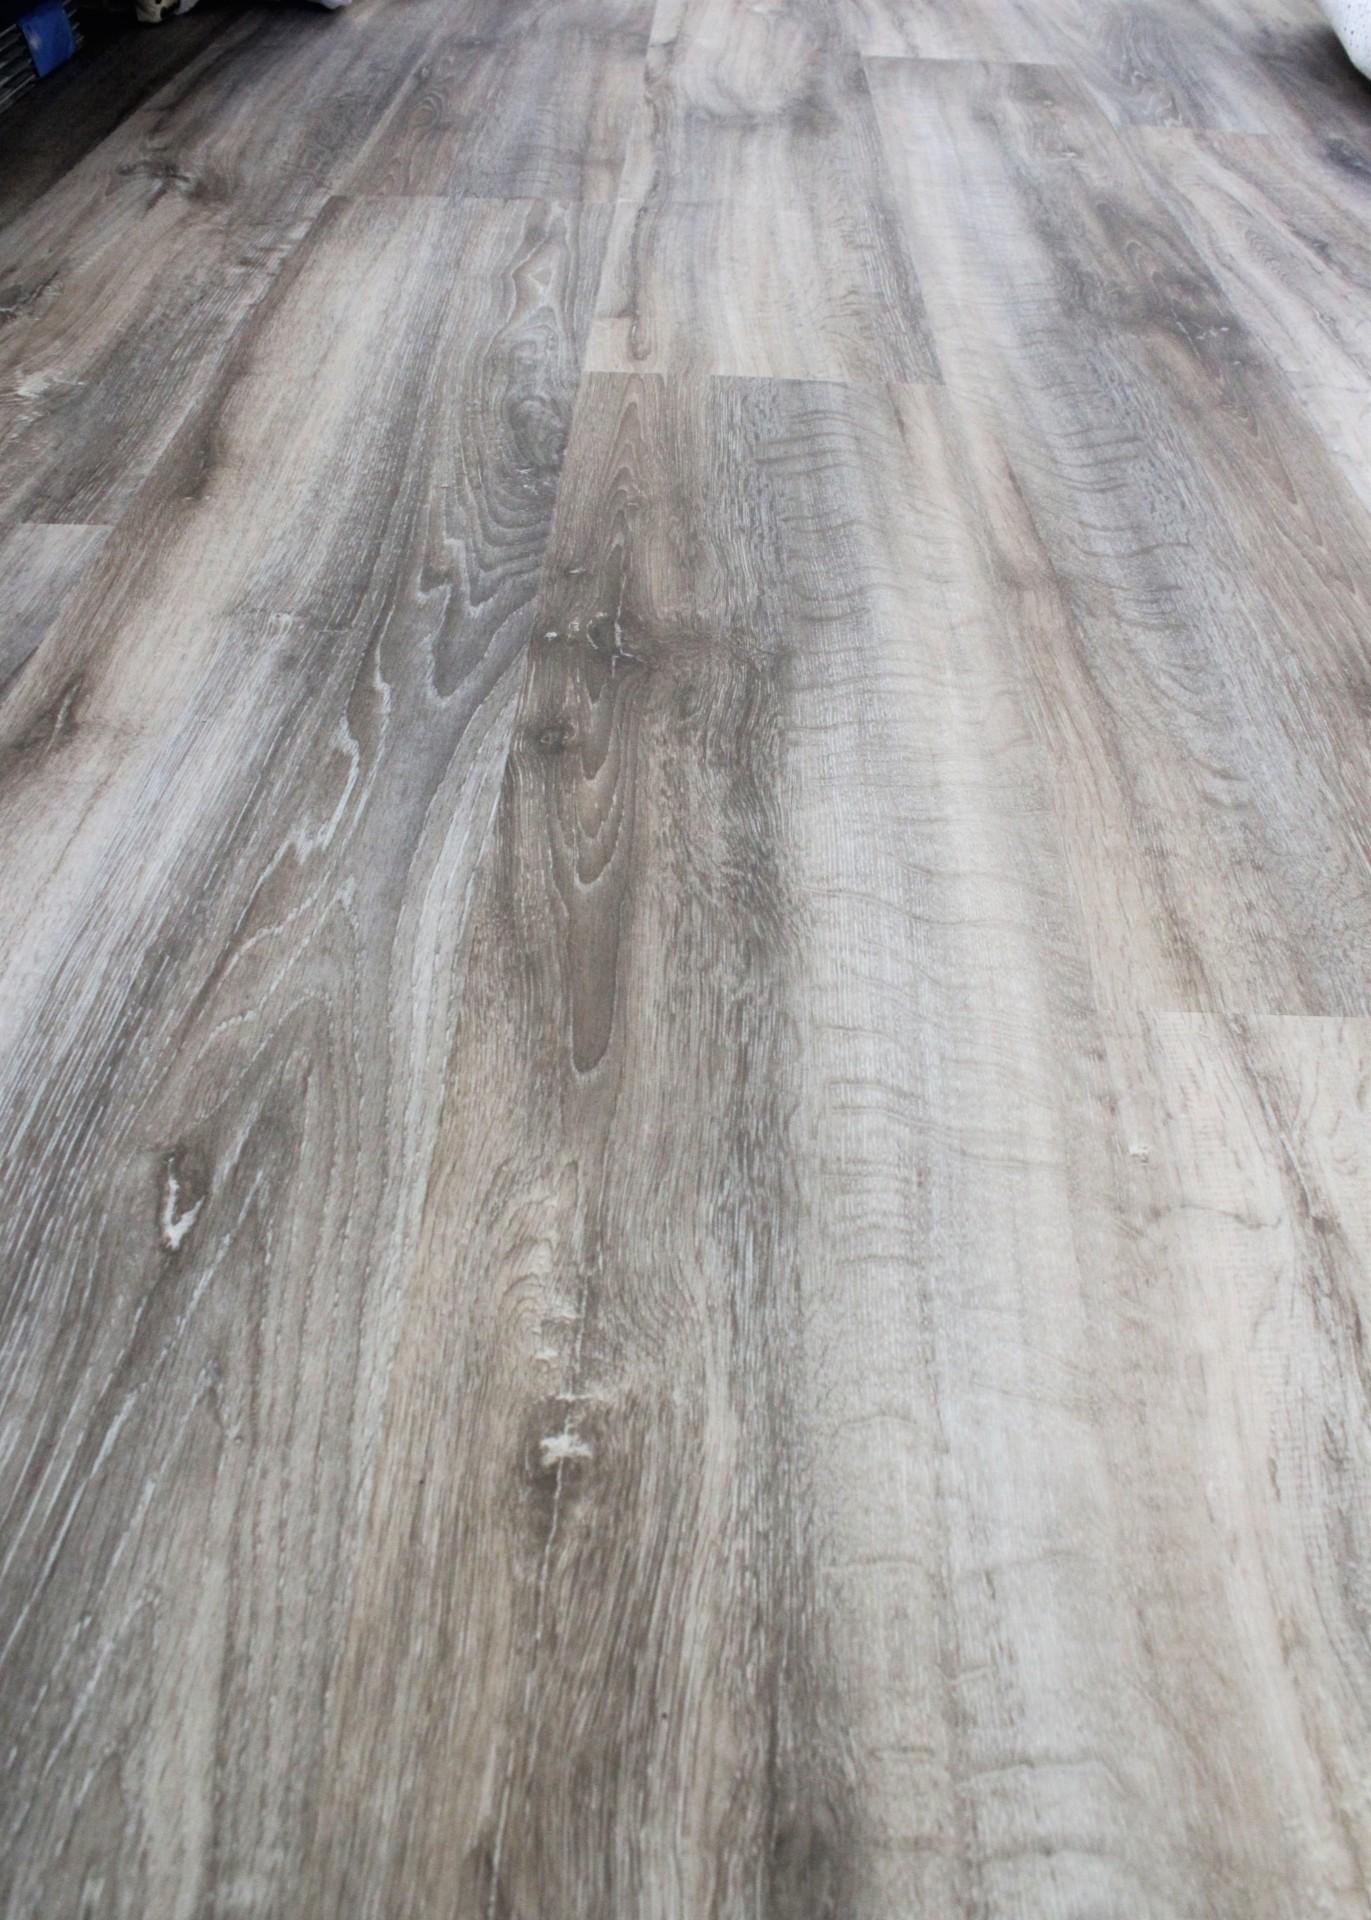 Vinyl, vinyl flooring, luxury vinyl planks, waterproof flooring, water resistant flooring, waterproof wood floors, pcp flooring, planking, grey floor, light floor, knots, laminate